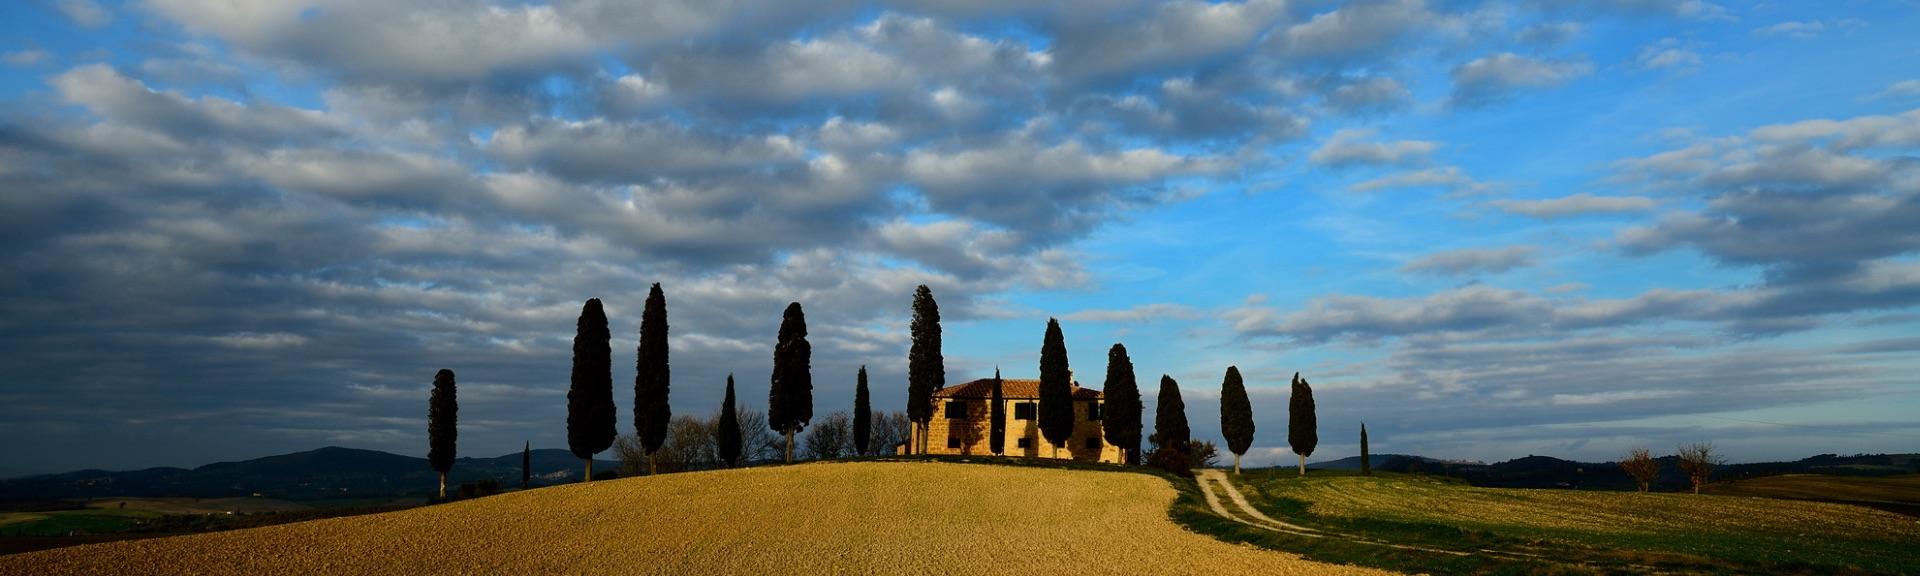 Blog Frames Federico Serrani